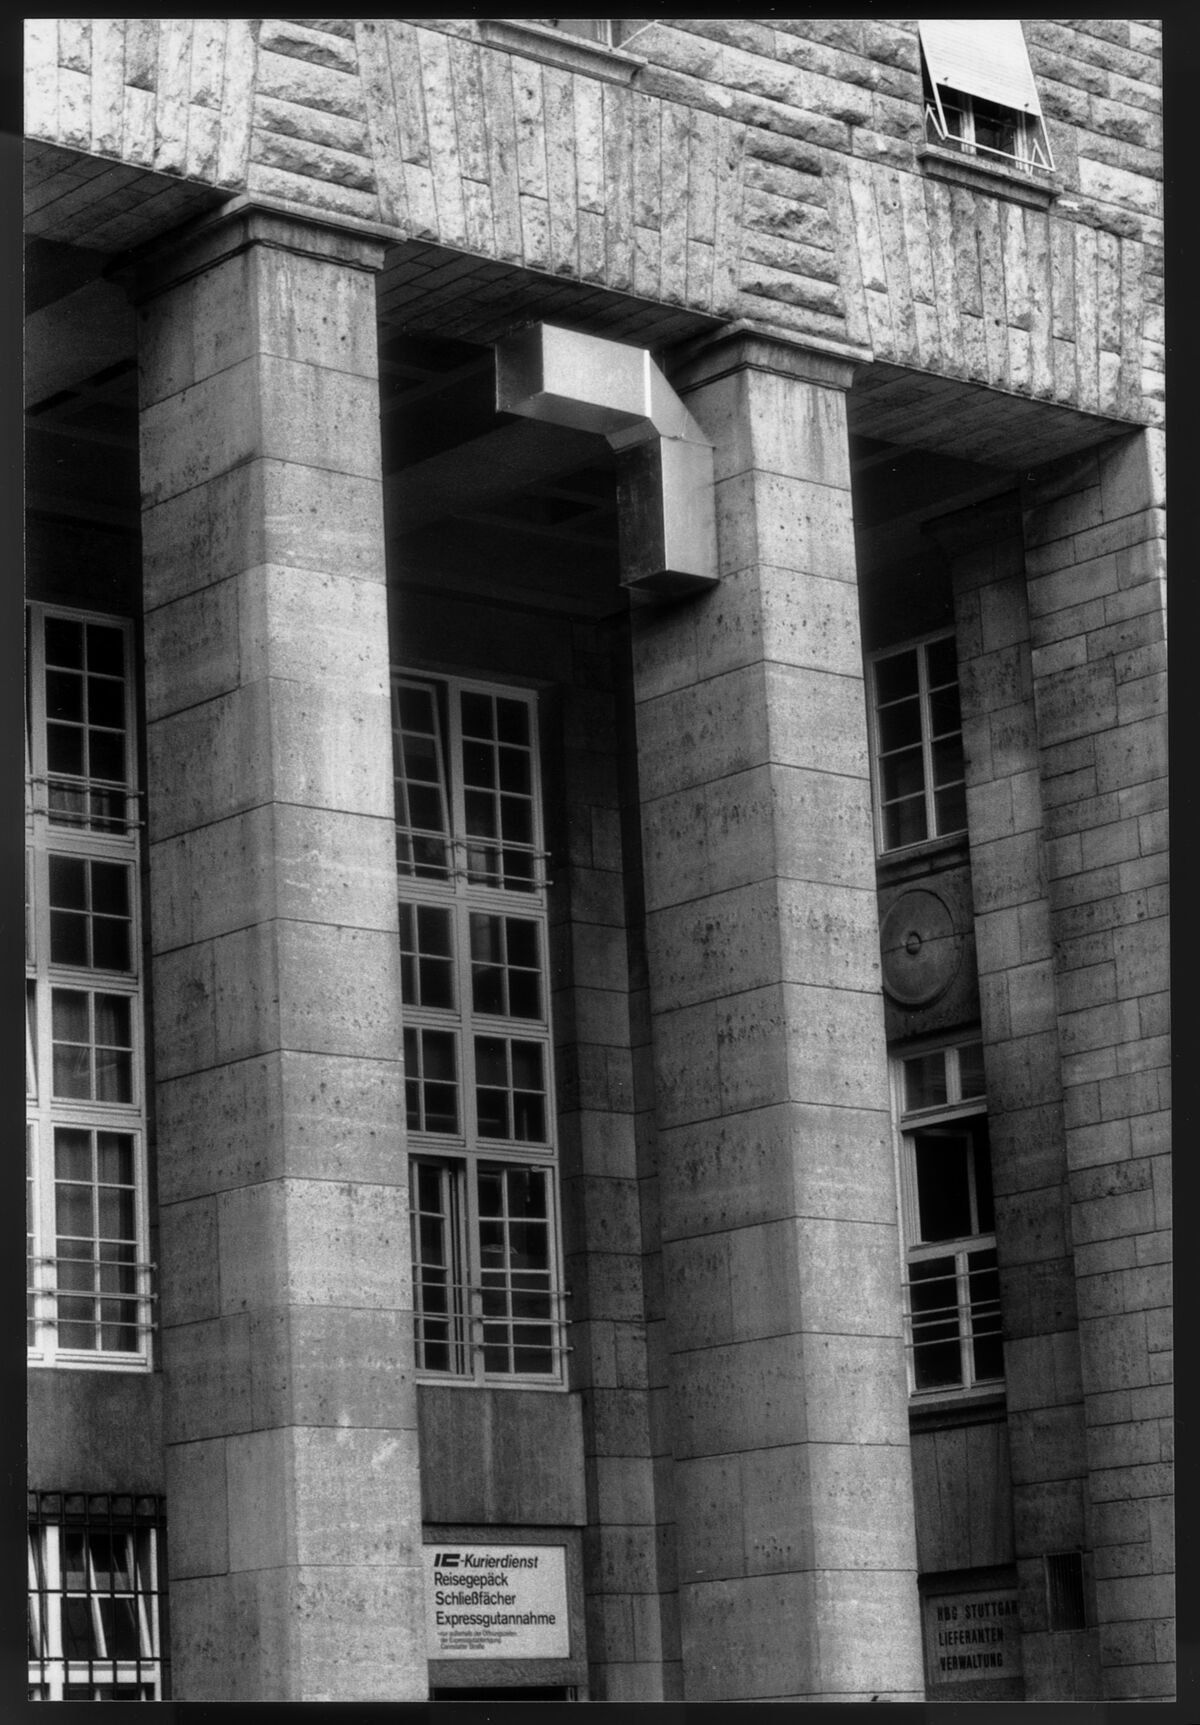 Installation view of Charlotte Posenenske, Vierantrohr (Square Tube), Series D, 1967, at Main Station Stuttgart, 1989. © Estate of Charlotte Posenenske. Photo by Dr. Burkhard Brunn, Frankfurt am Main. Courtesy of the Estate of Charlotte Posenenske; Mehdi Chouakri, Berlin; and Peter Freeman, New York.